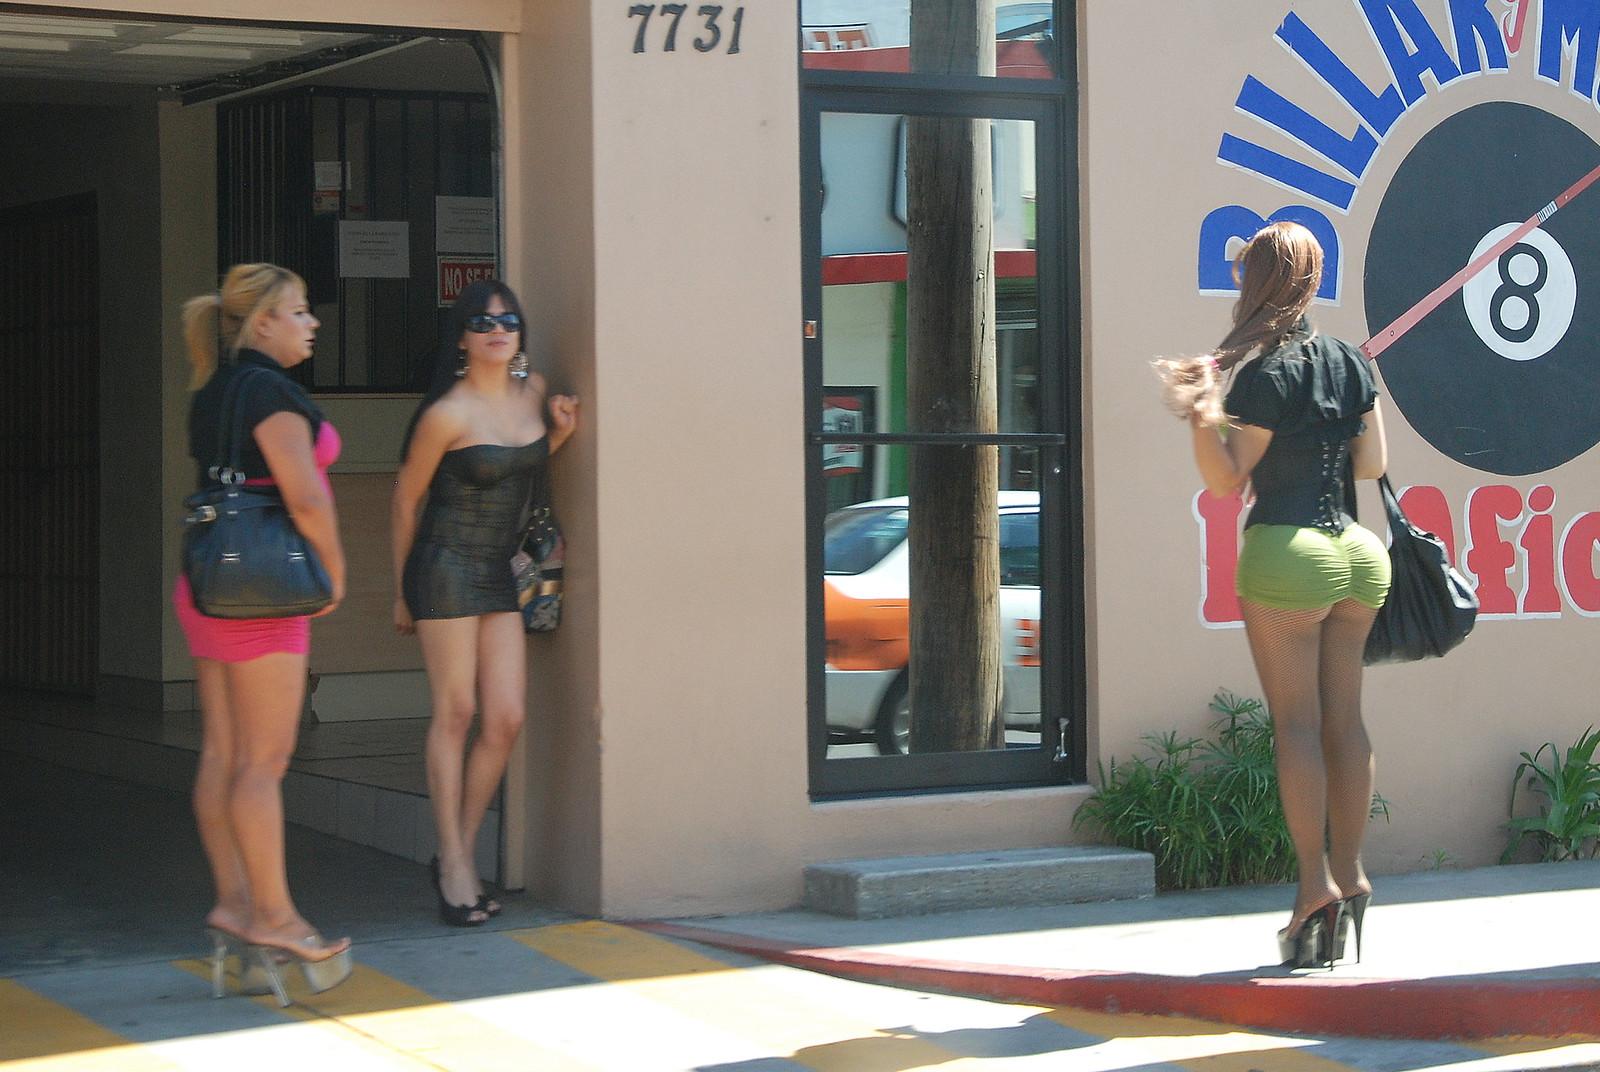 Escort In Belem Brazil Prostitutes